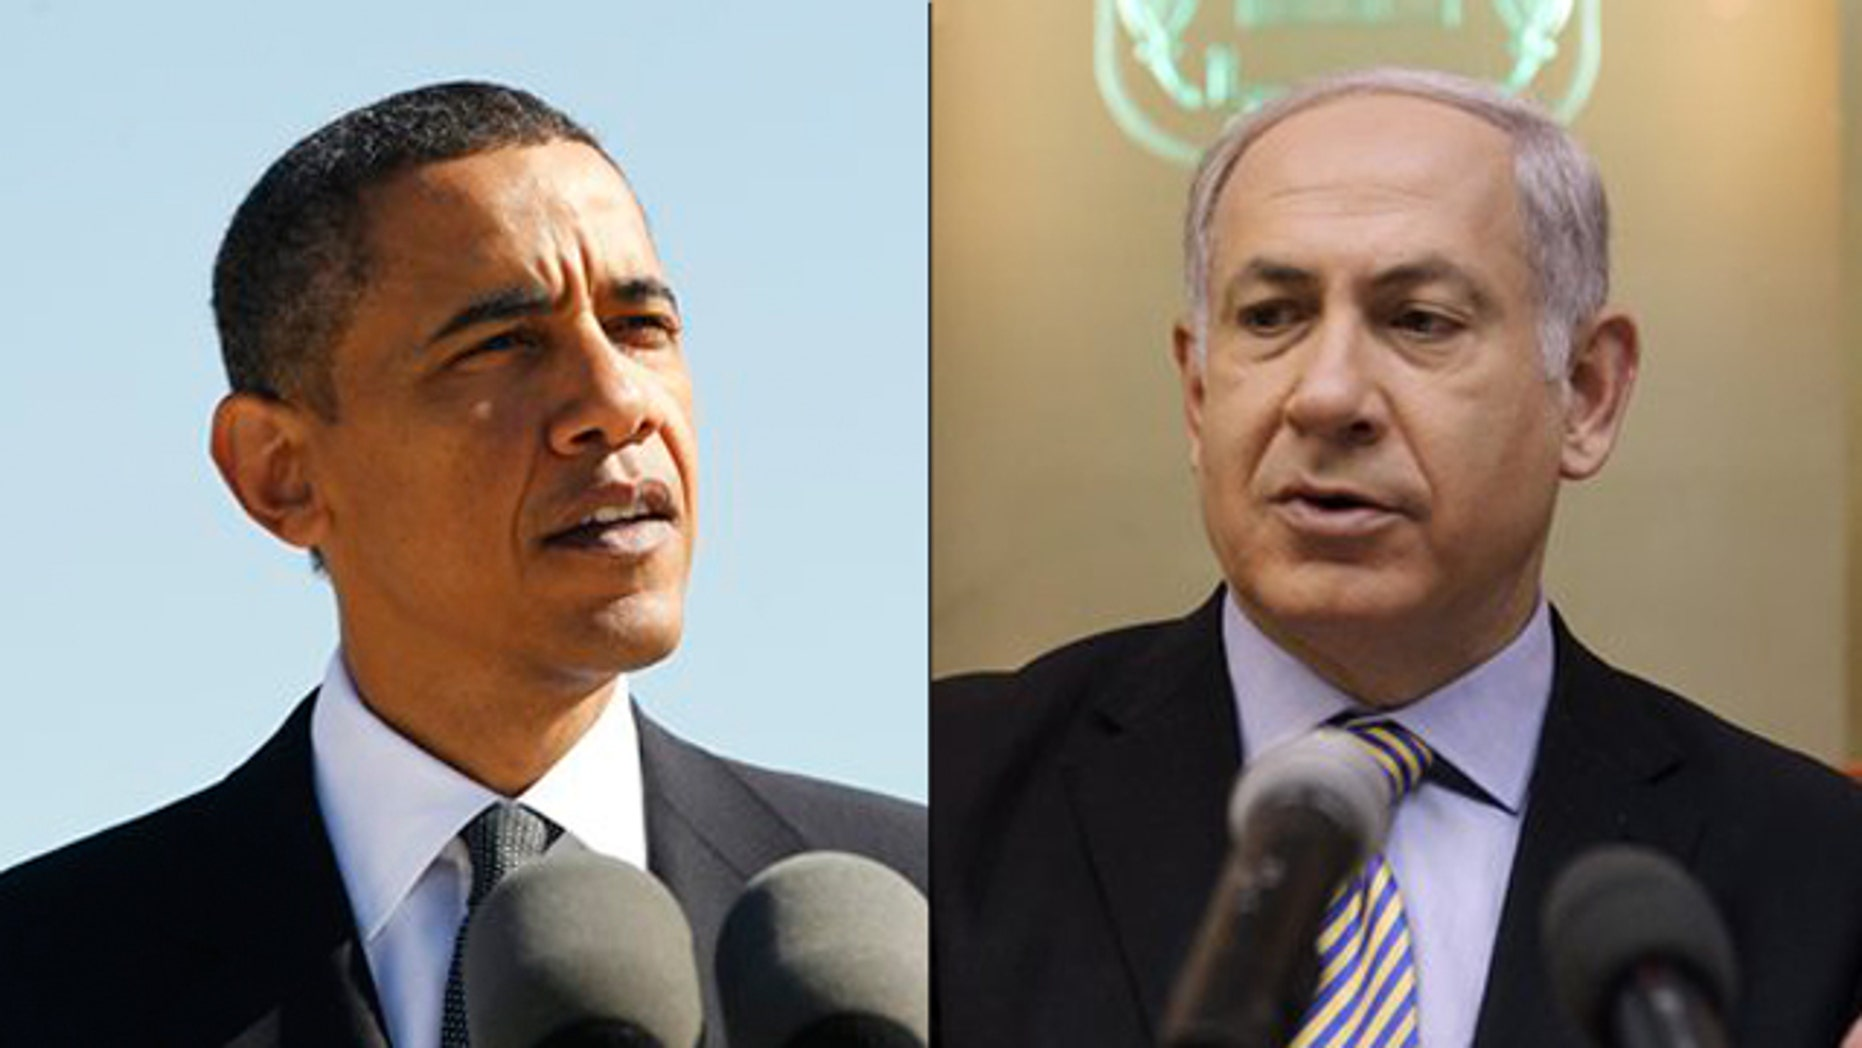 Shown here are President Obama and Israeli Prime Minister Benjamin Netanyahu. (AP Photos)